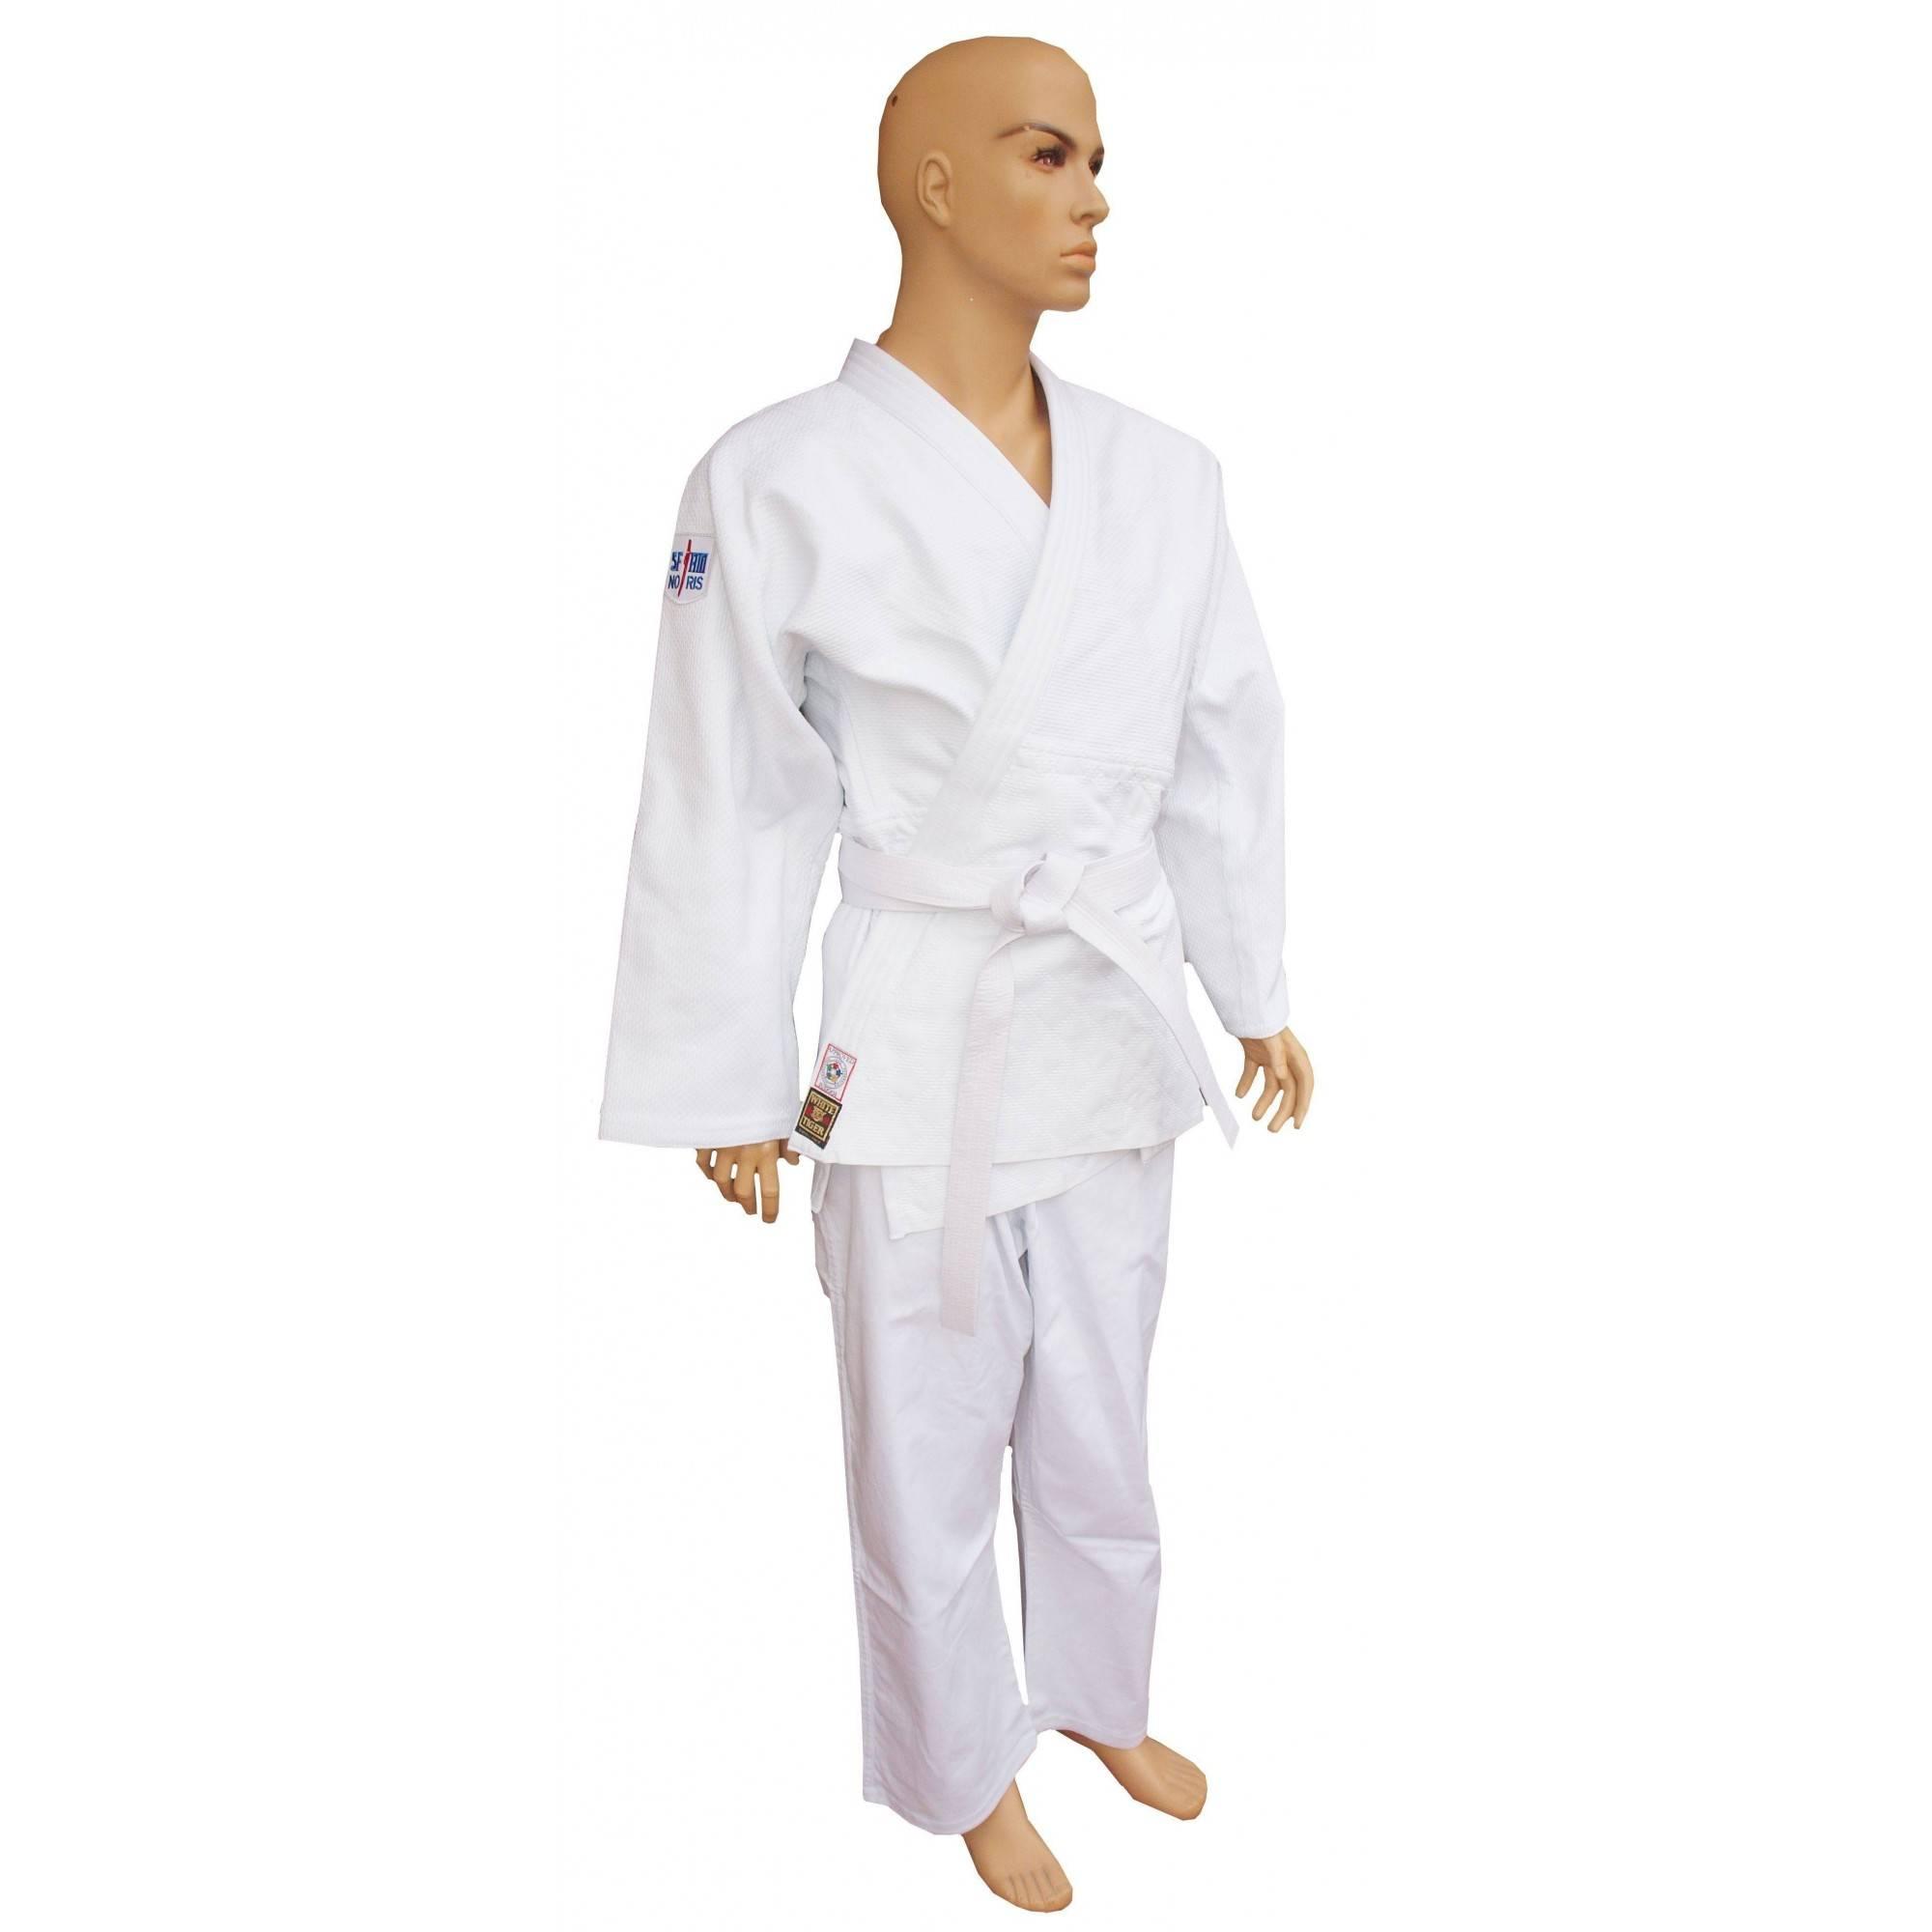 Kimono judo profesjonalne Sfjam-Noris White Tiger Excellence | 165cm | white,producent: SFJAM NORIS, zdjecie photo: 1 | online s